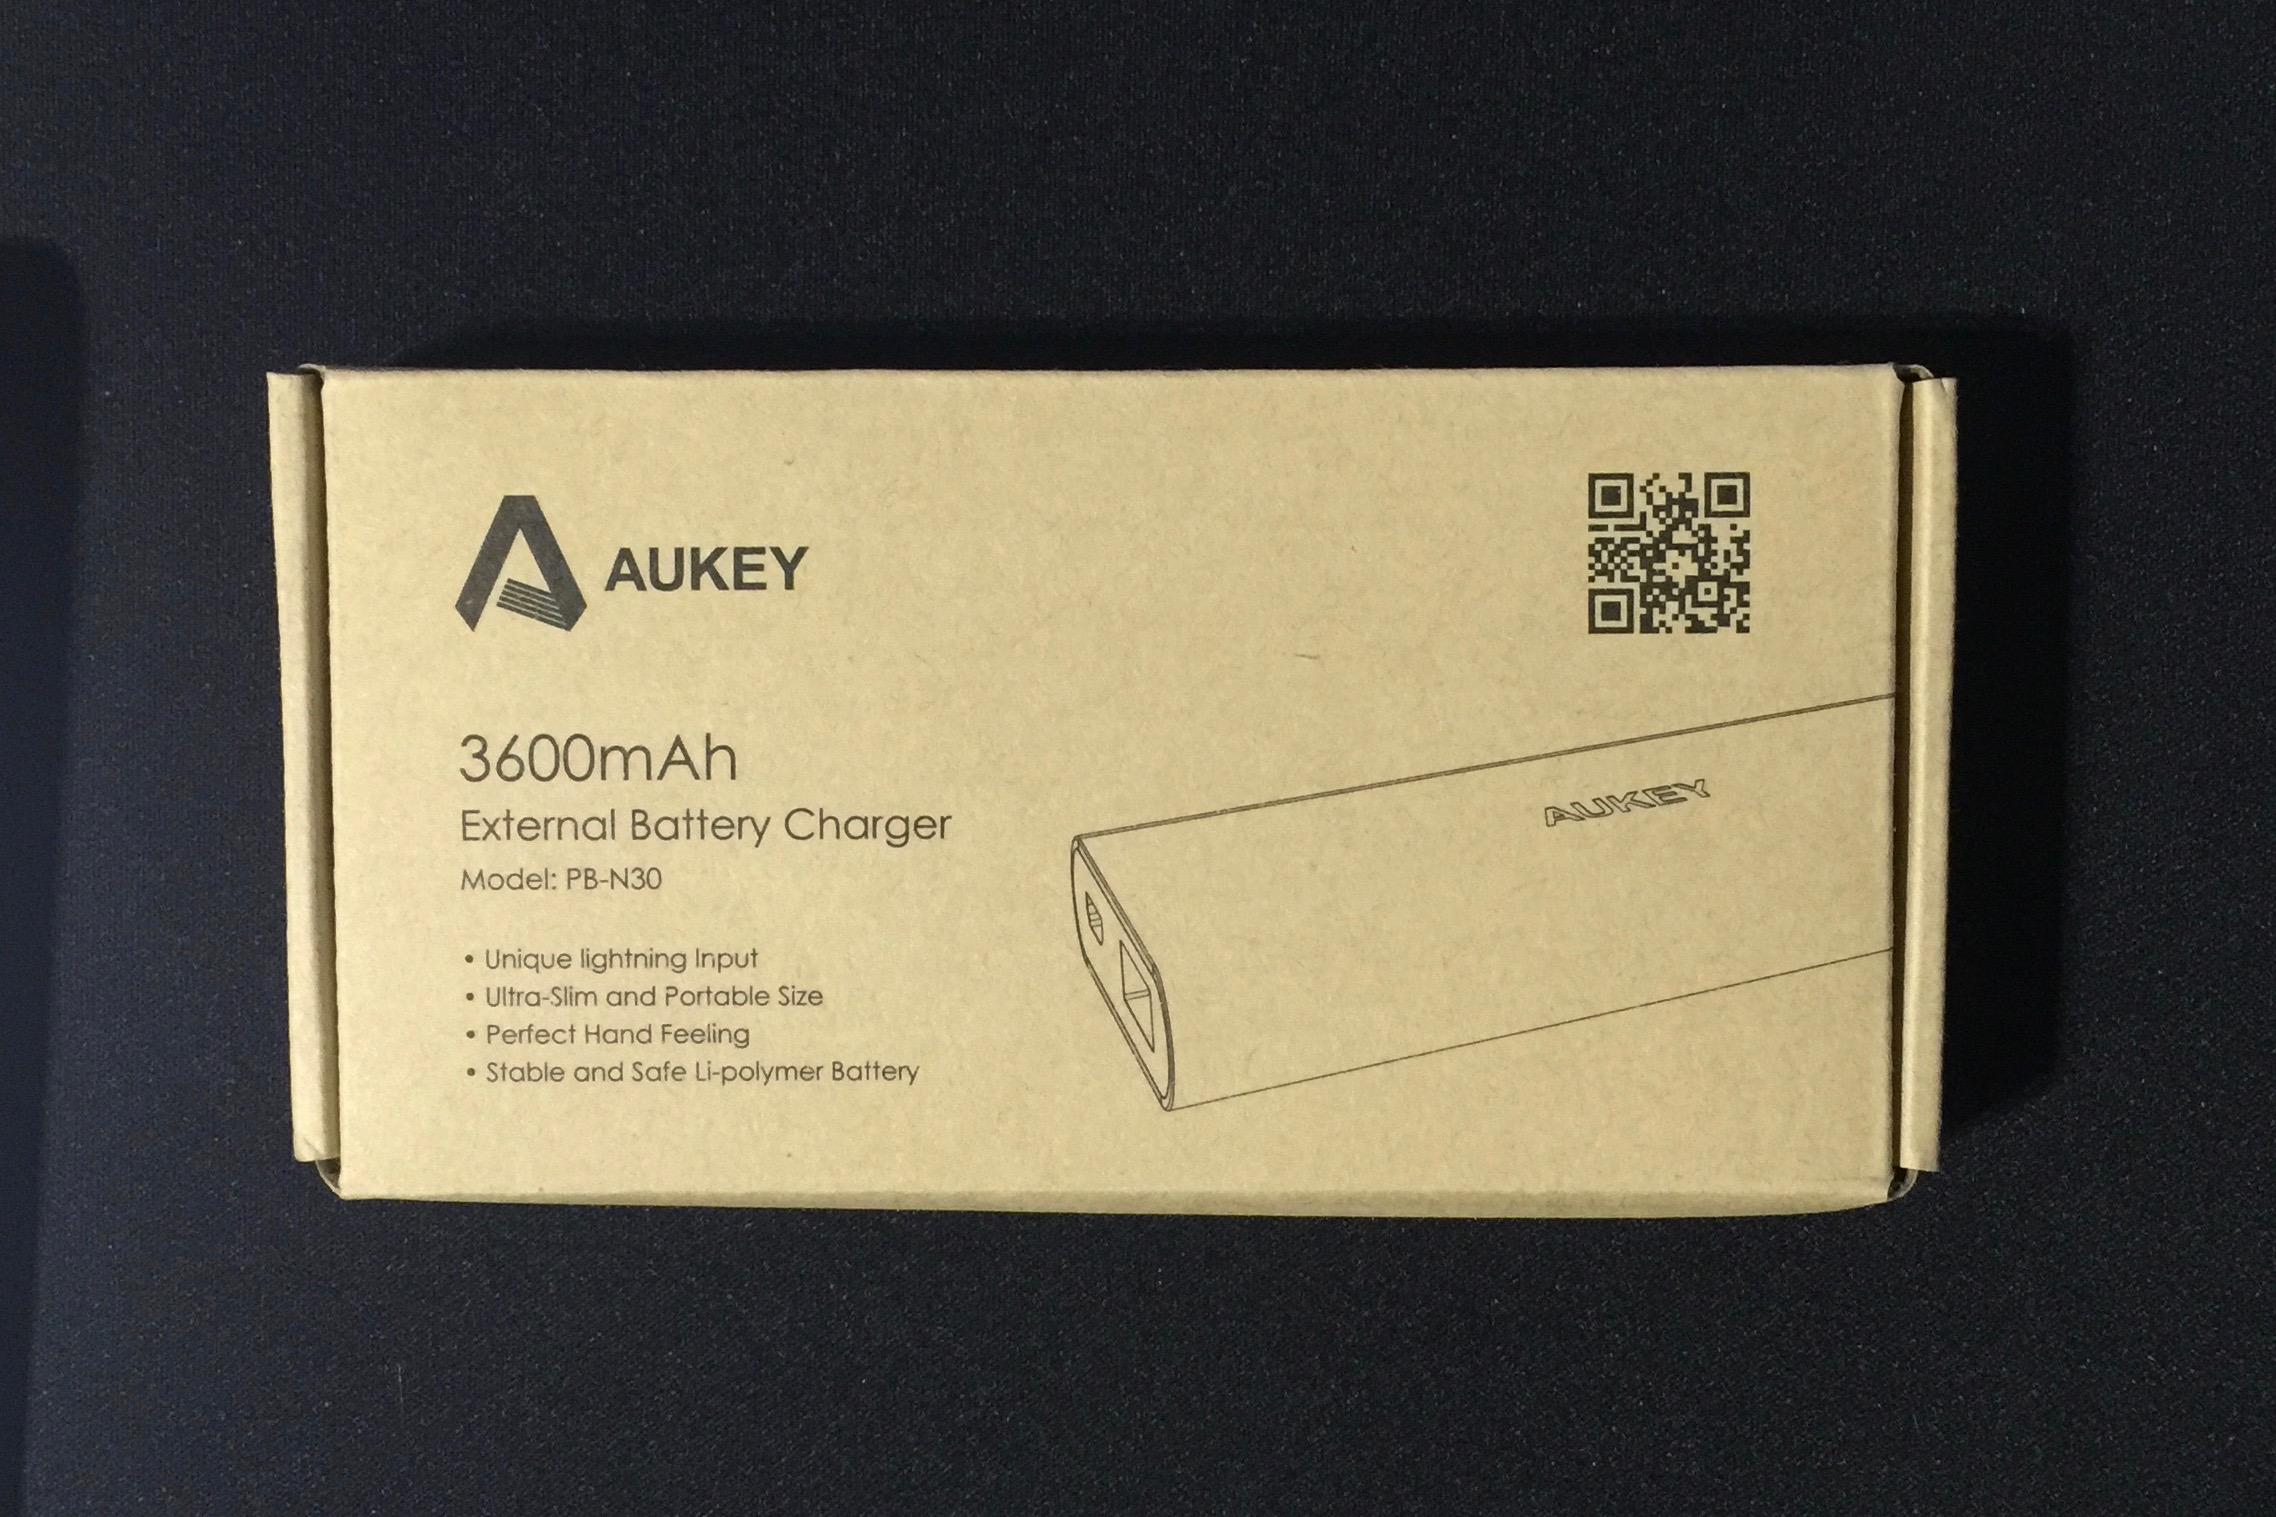 AUKEY PB-N30 2